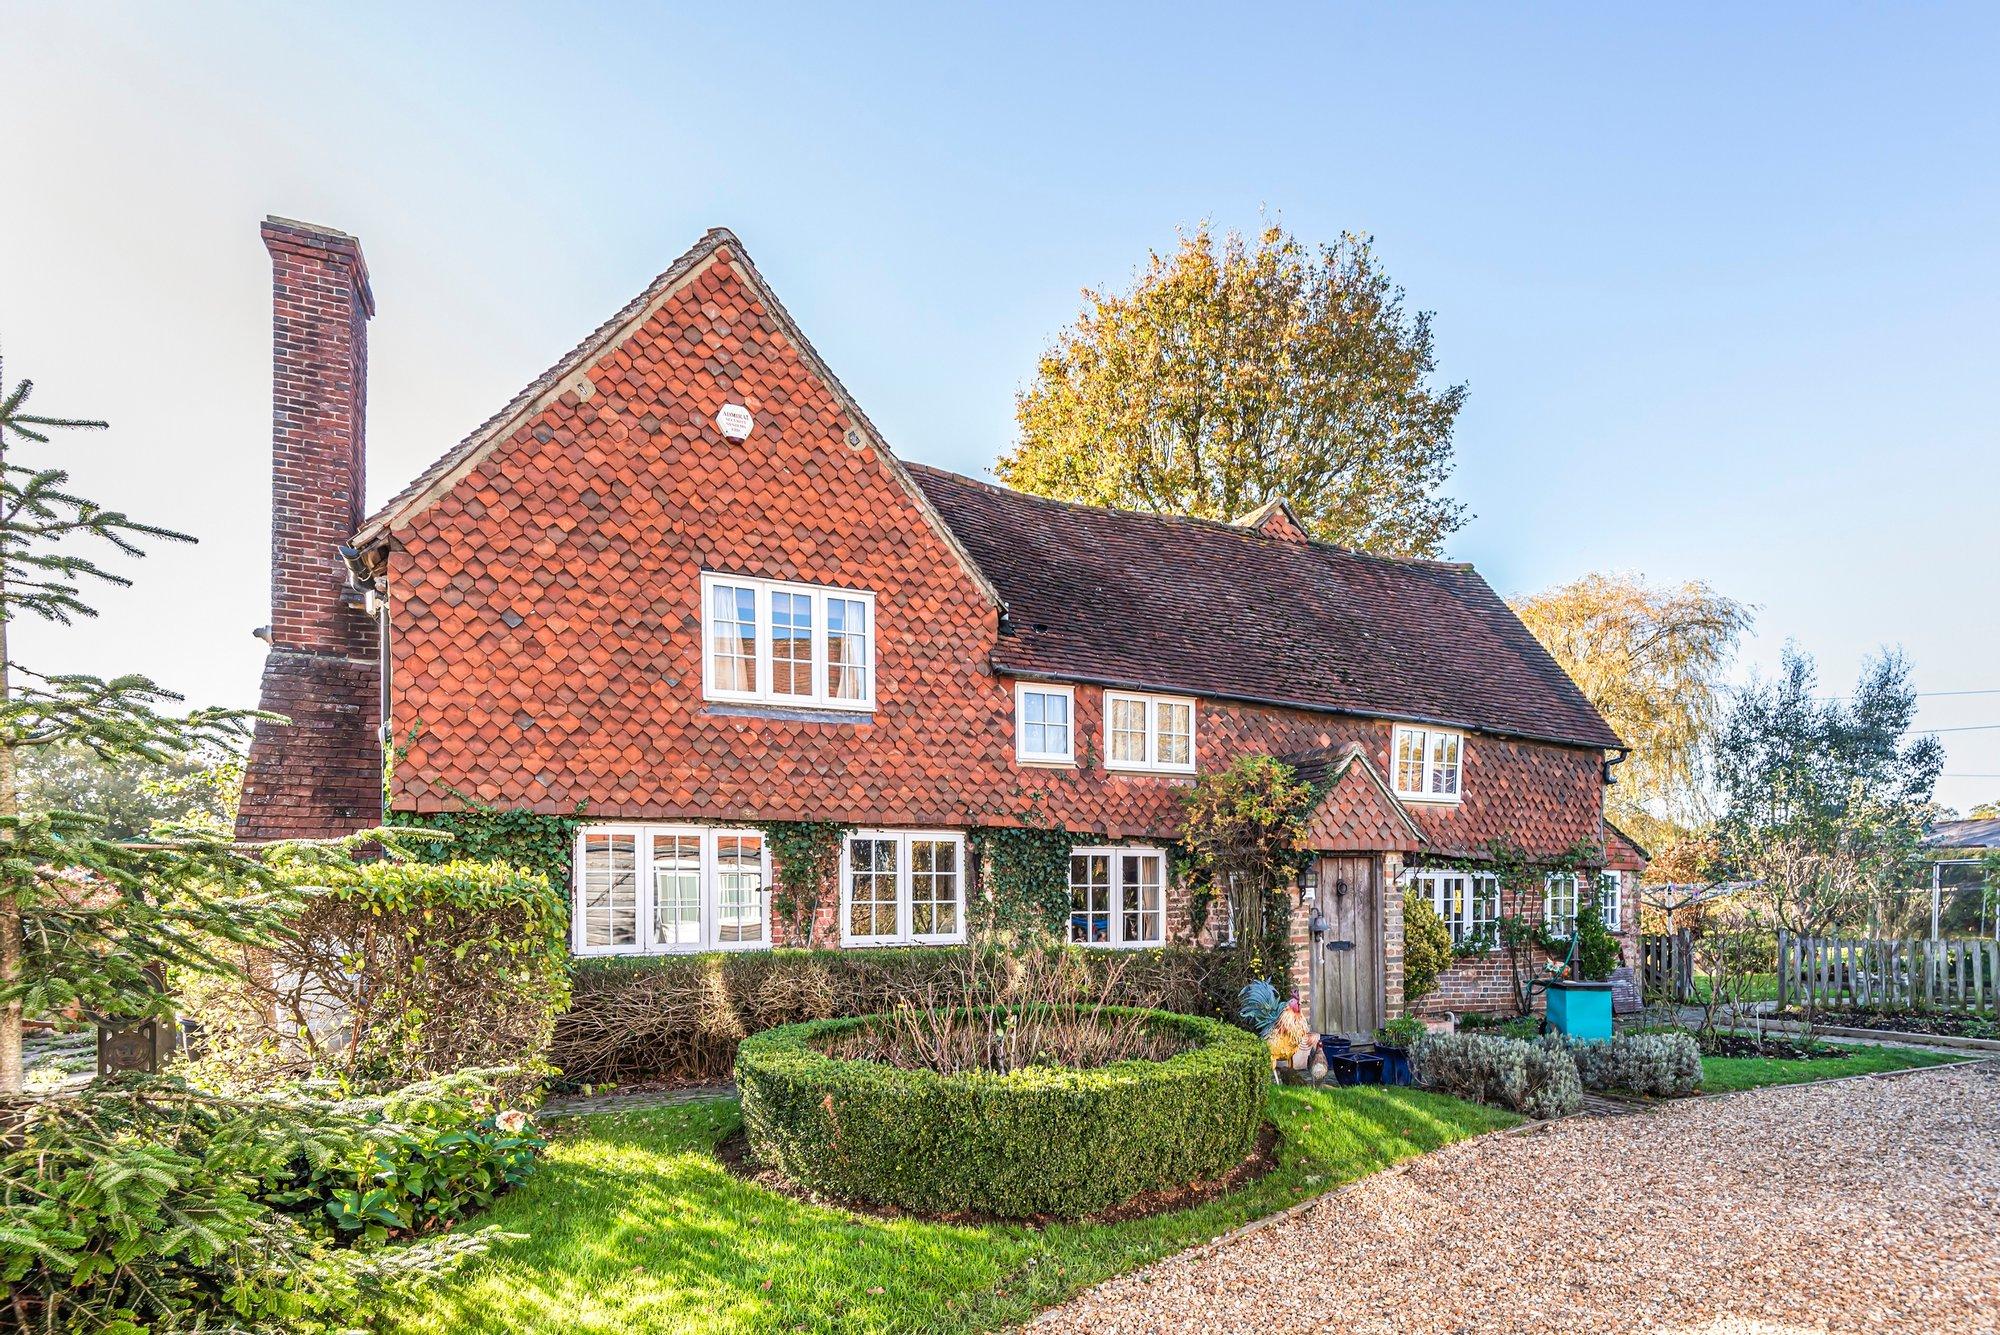 House in Smallfield, England, United Kingdom 1